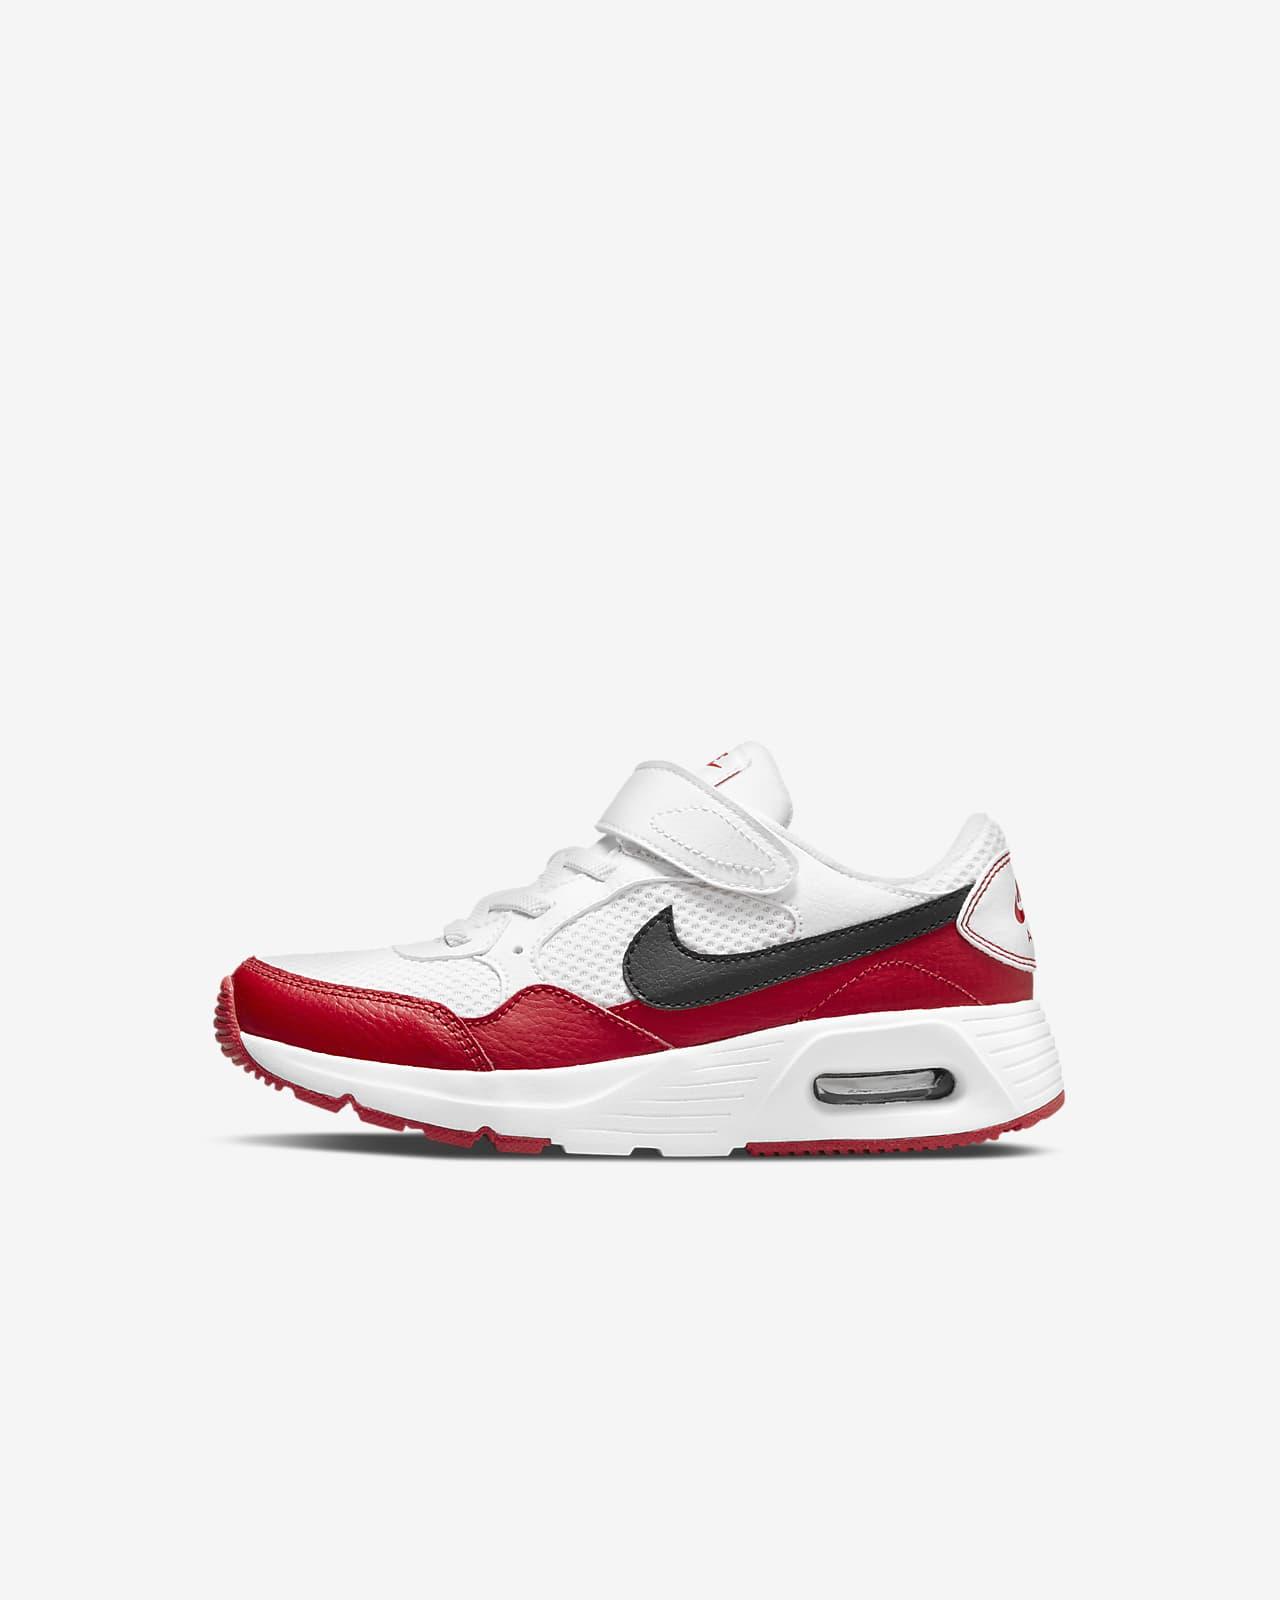 Nike Air Max SC Little Kids' Shoes